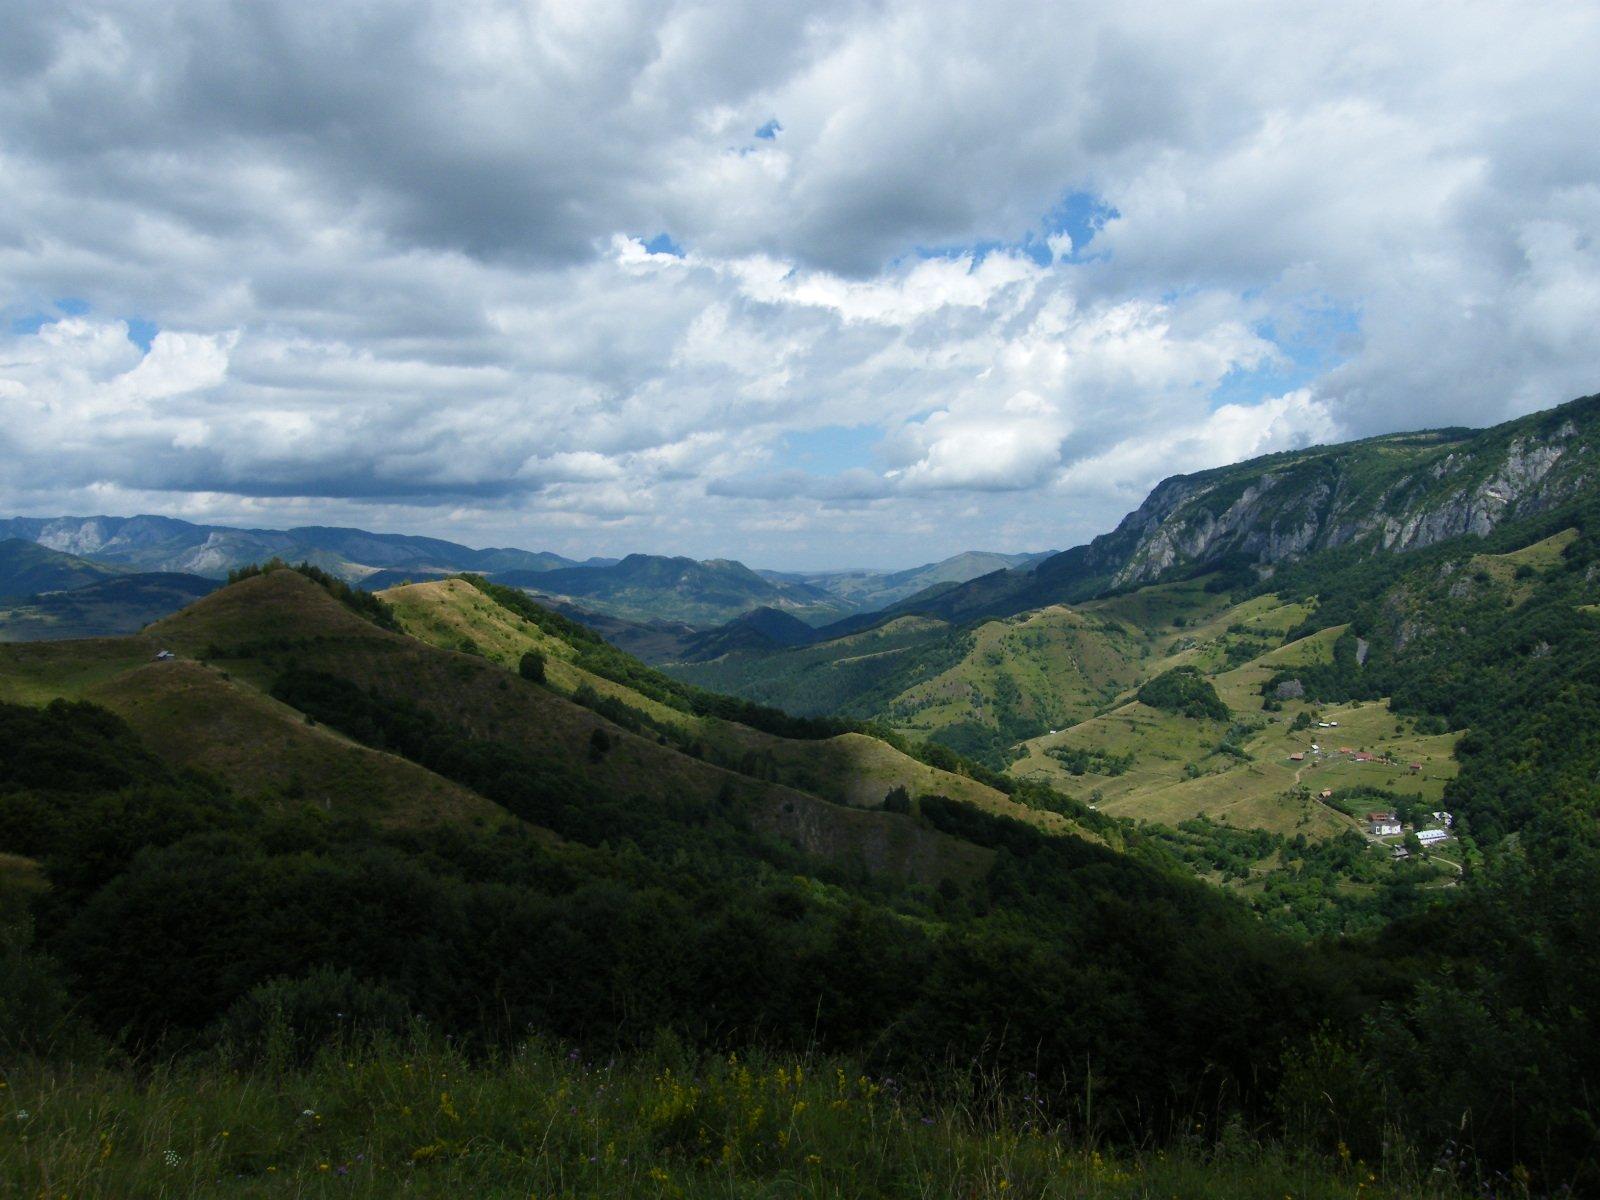 Aventuri pe bicicleta – Expeditie in Muntii Apuseni – Traseul: Vartop – Stei (BH)